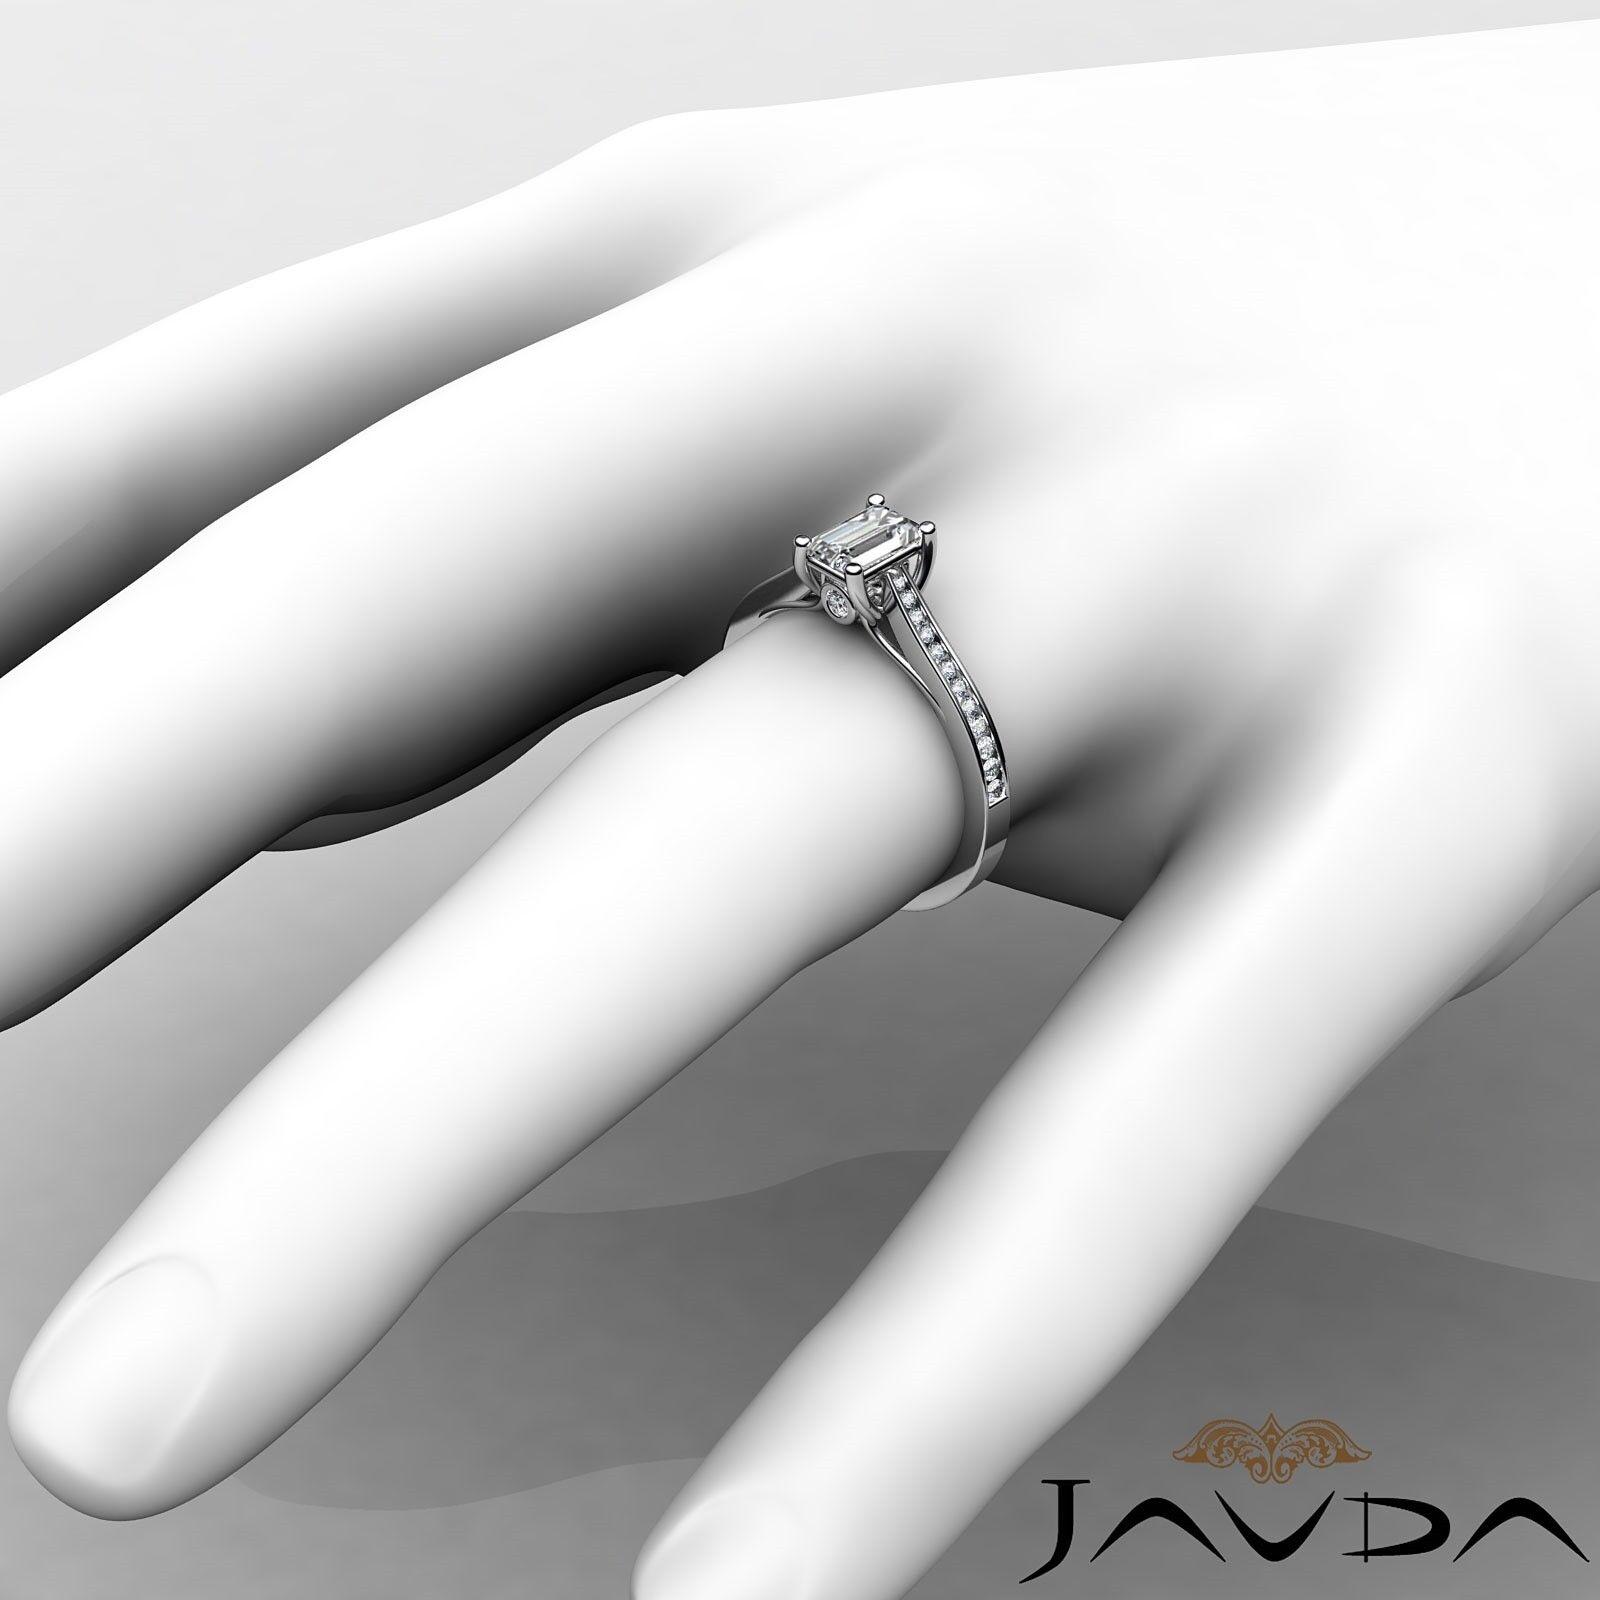 1.32ctw Channel Set Shank Emerald Diamond Engagement Ring GIA F-VVS2 White Gold 2